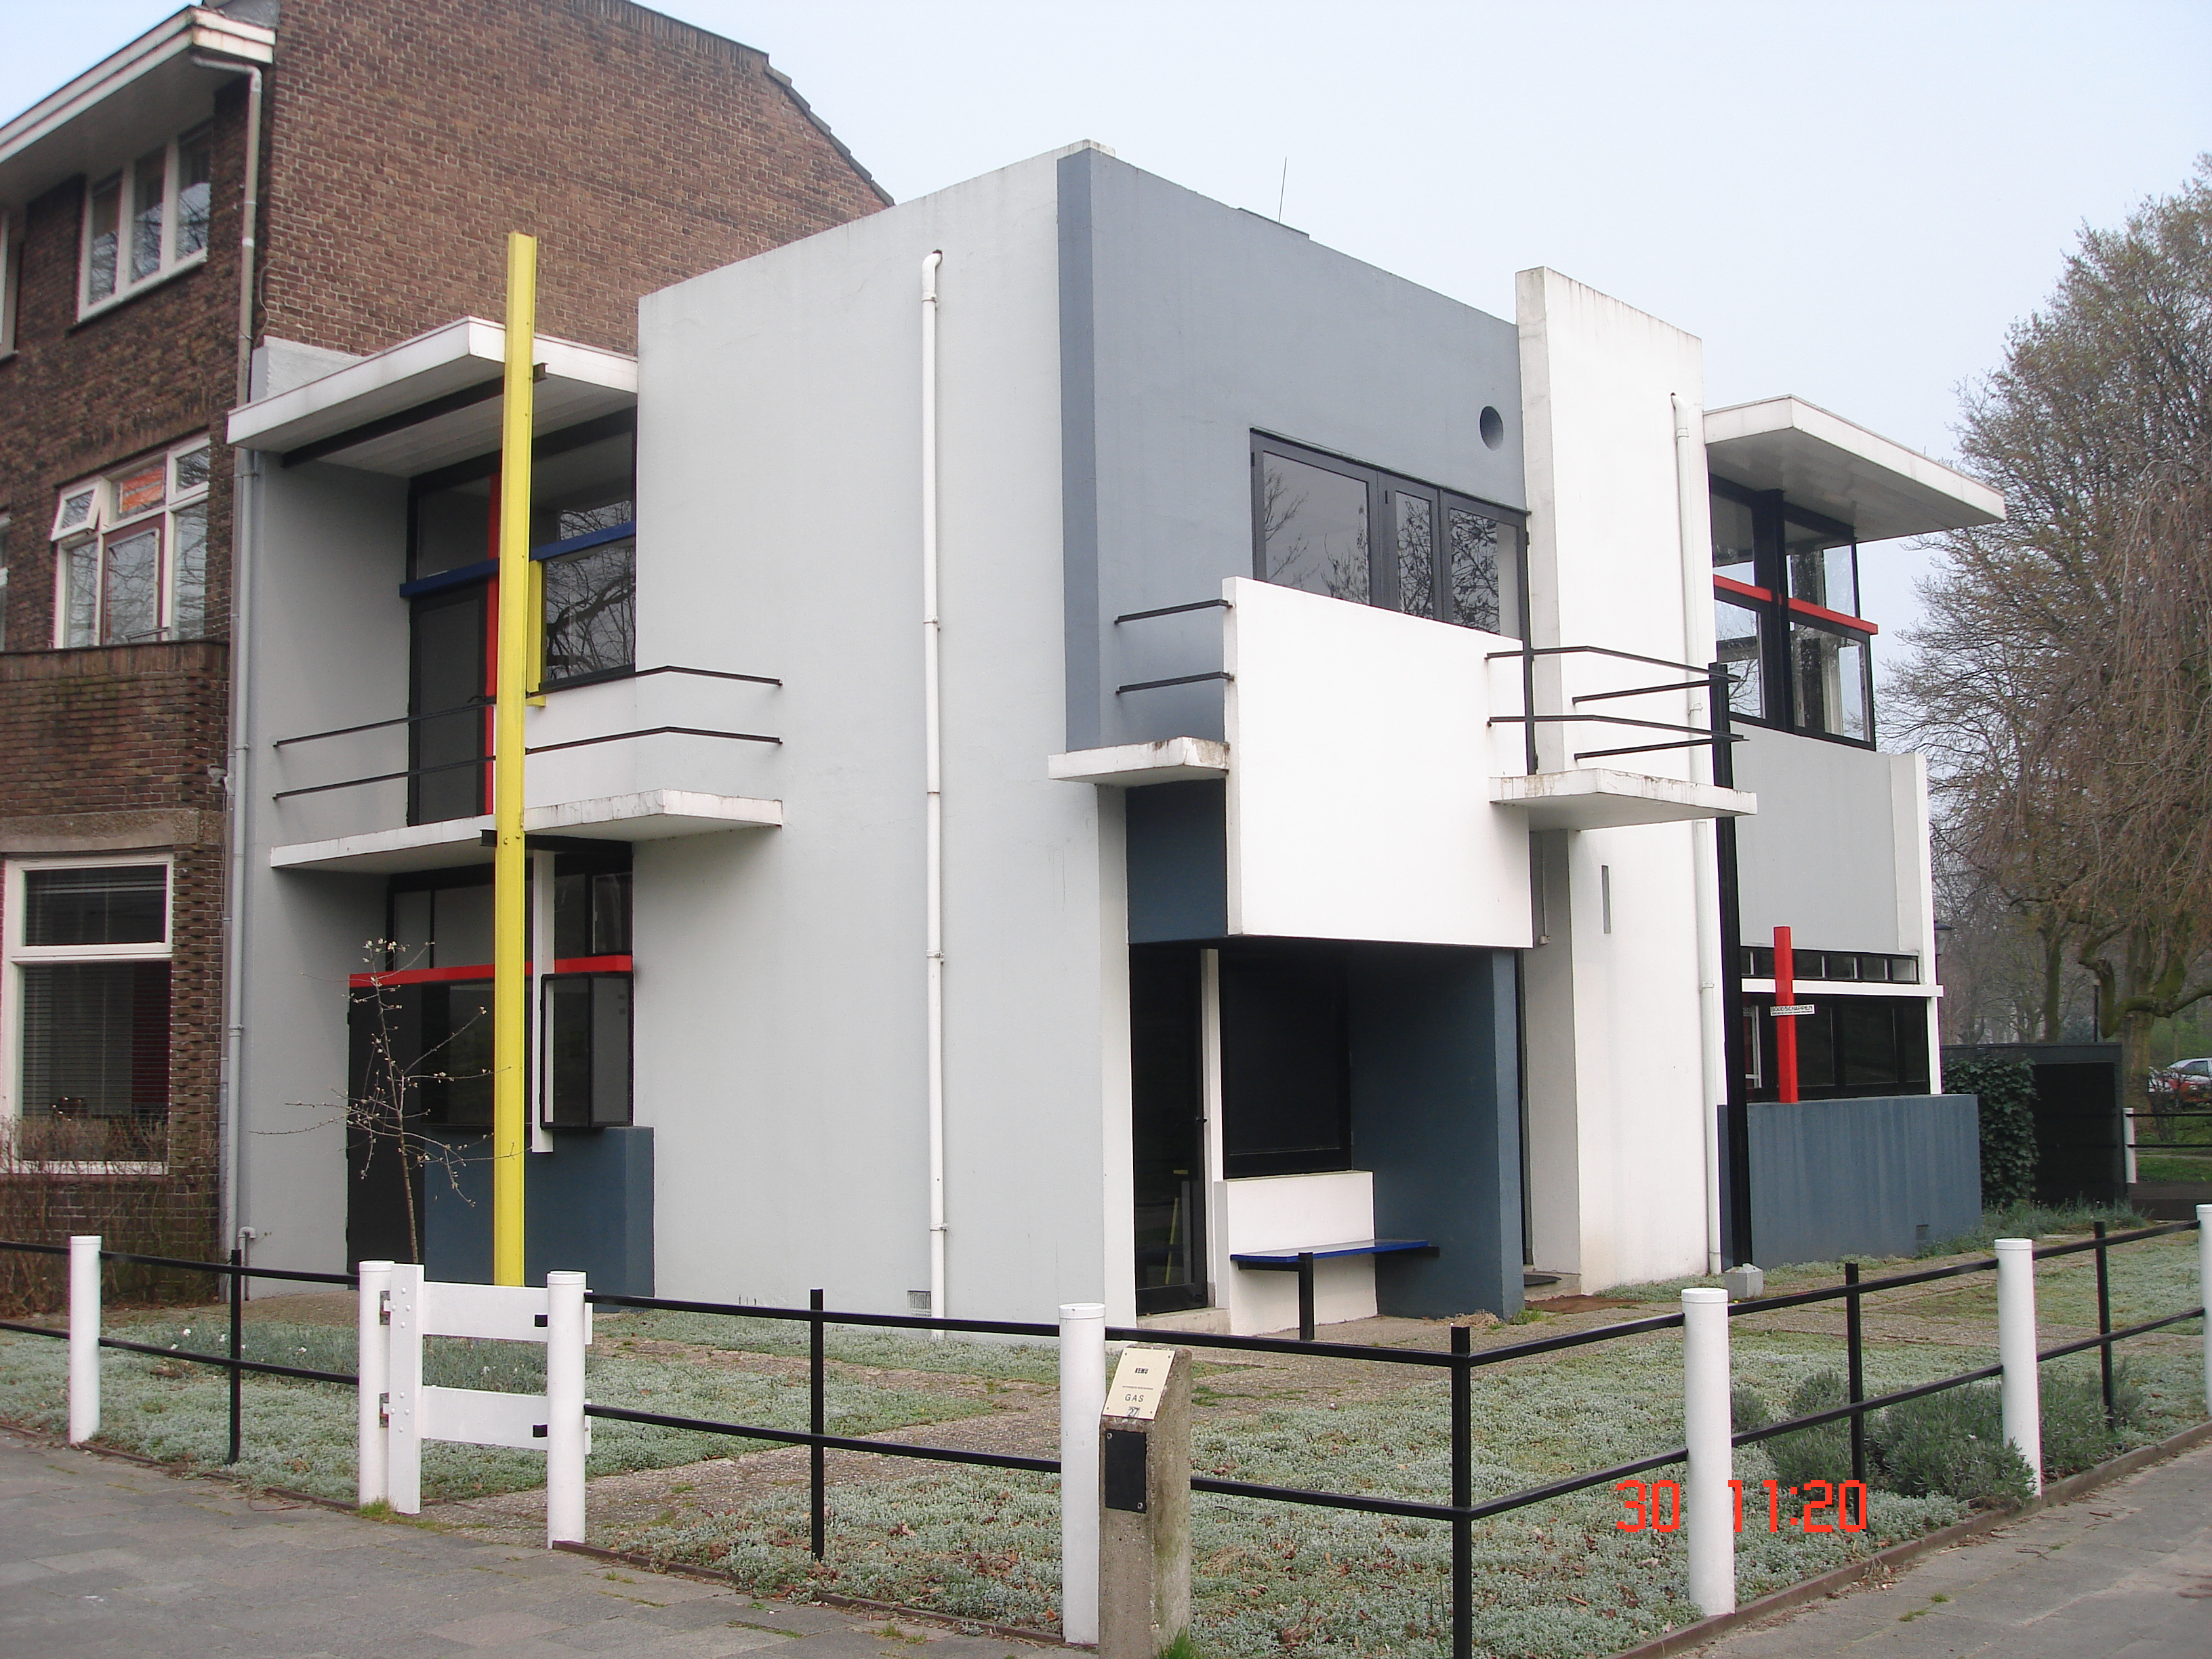 File rietveld schr derhuis jpg wikimedia commons - Stijl des maisons ...